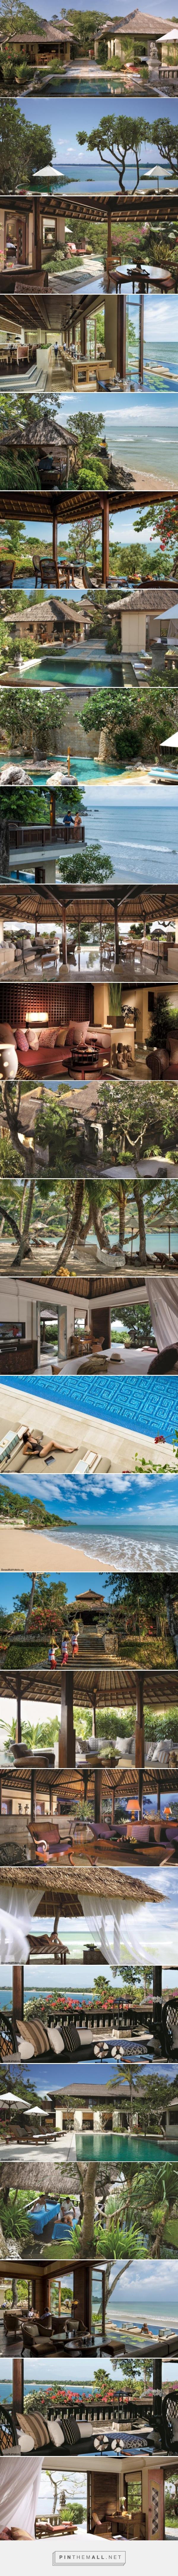 Four Seasons Resort Bali At Jimbaran Bay Indonesia Voucher Resorts Sayan Beautiful Hotels